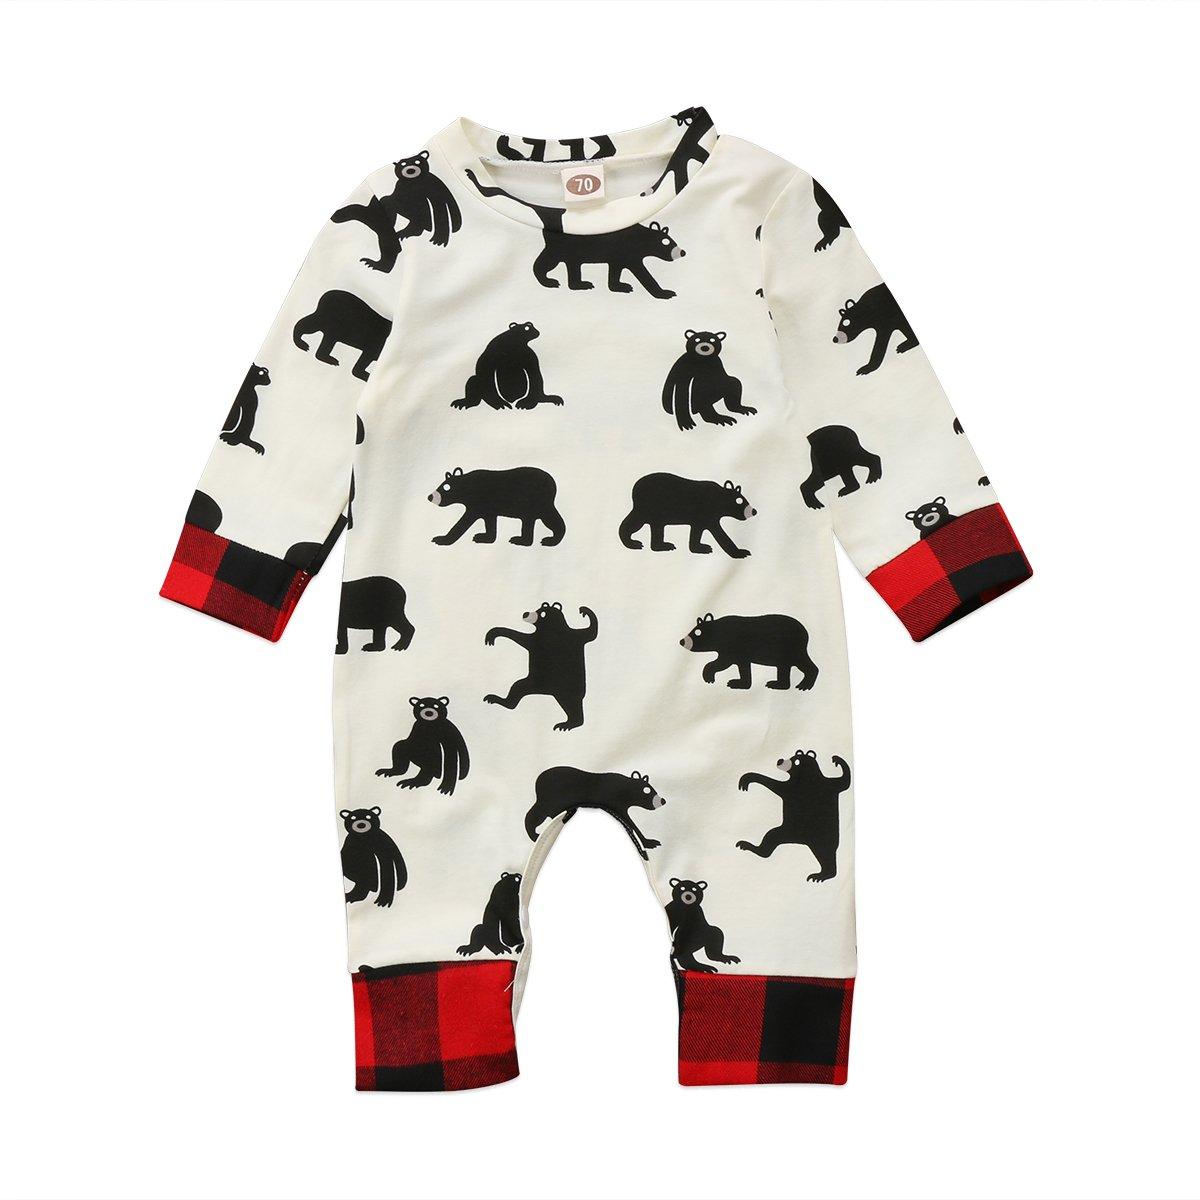 Carolilly Unisex Baby Christmas Bodysuits Toddler Long Sleeve Romper Baby Boys Girls Overalls Jumpsuit